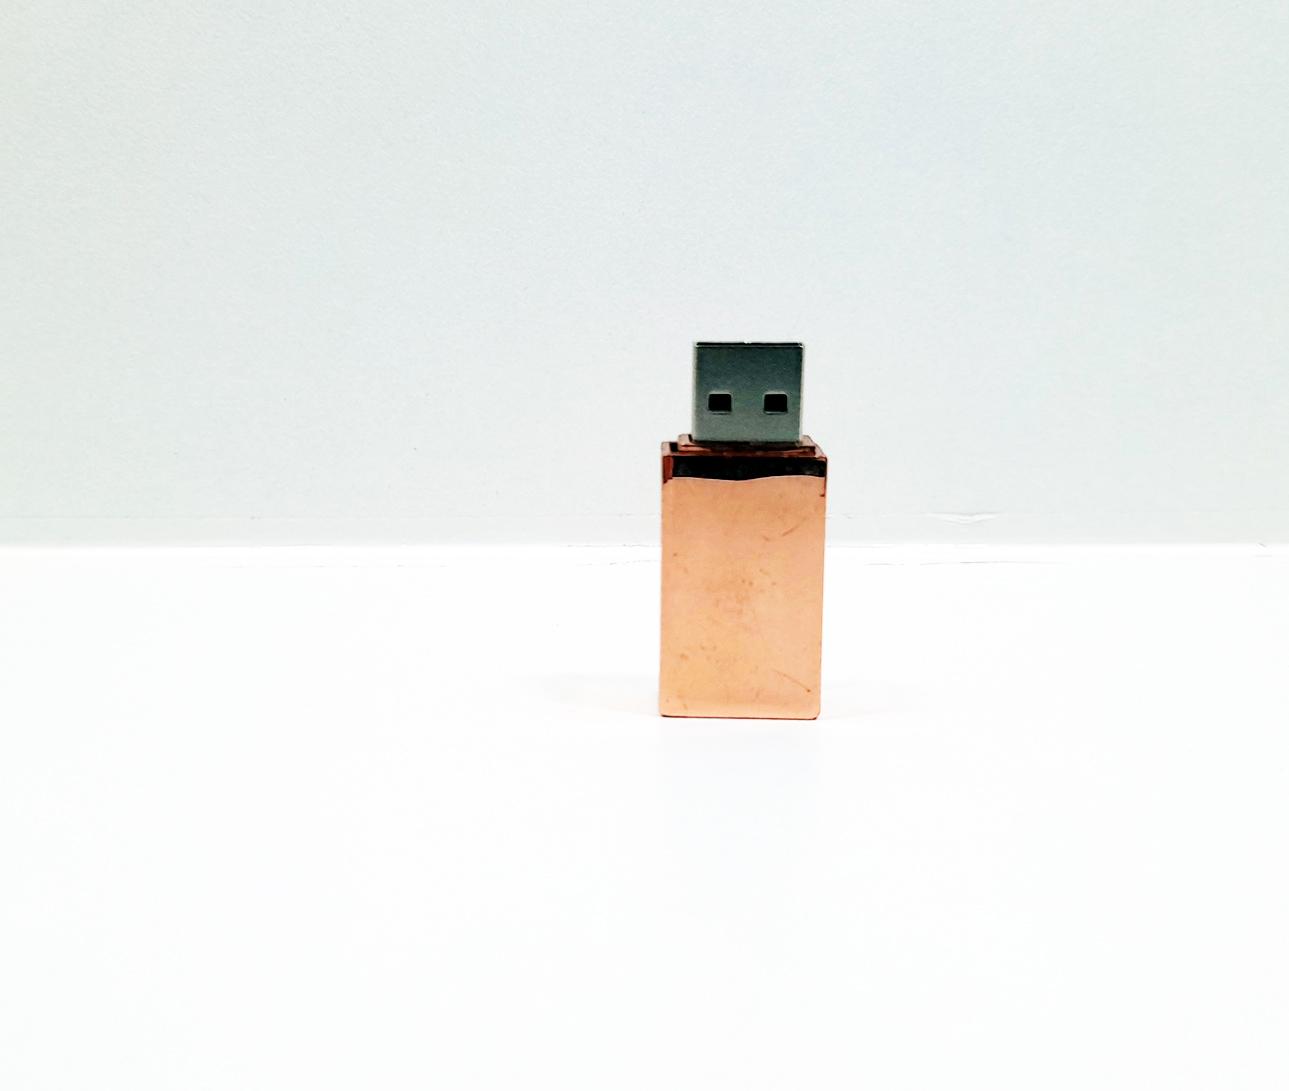 Linha rECOdrive - Pendrives Ecologicos Sustentáveis - Fit Colors 8 GB e 16 GB - Exclusivo